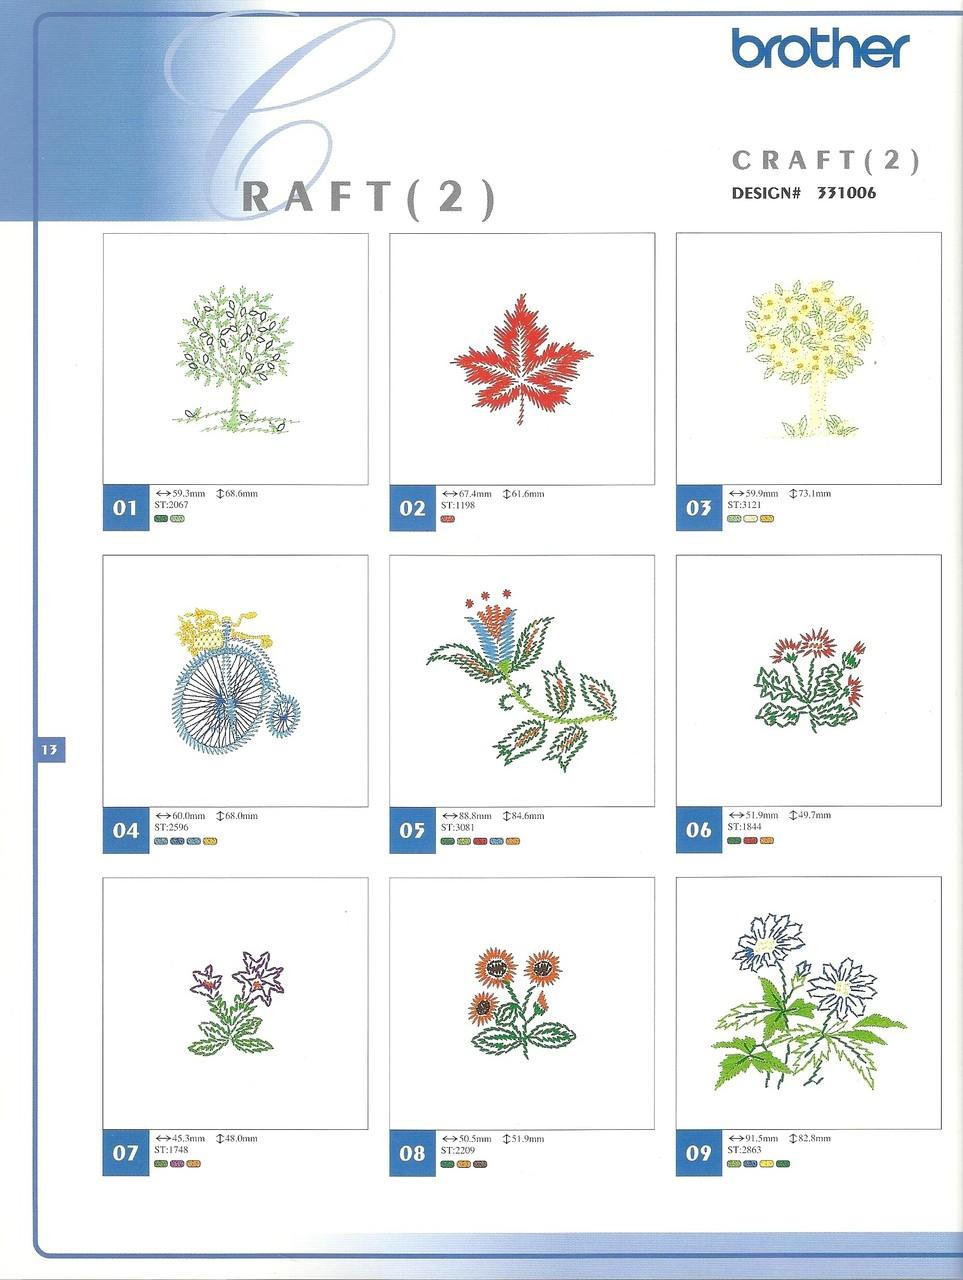 331006 Crafts II